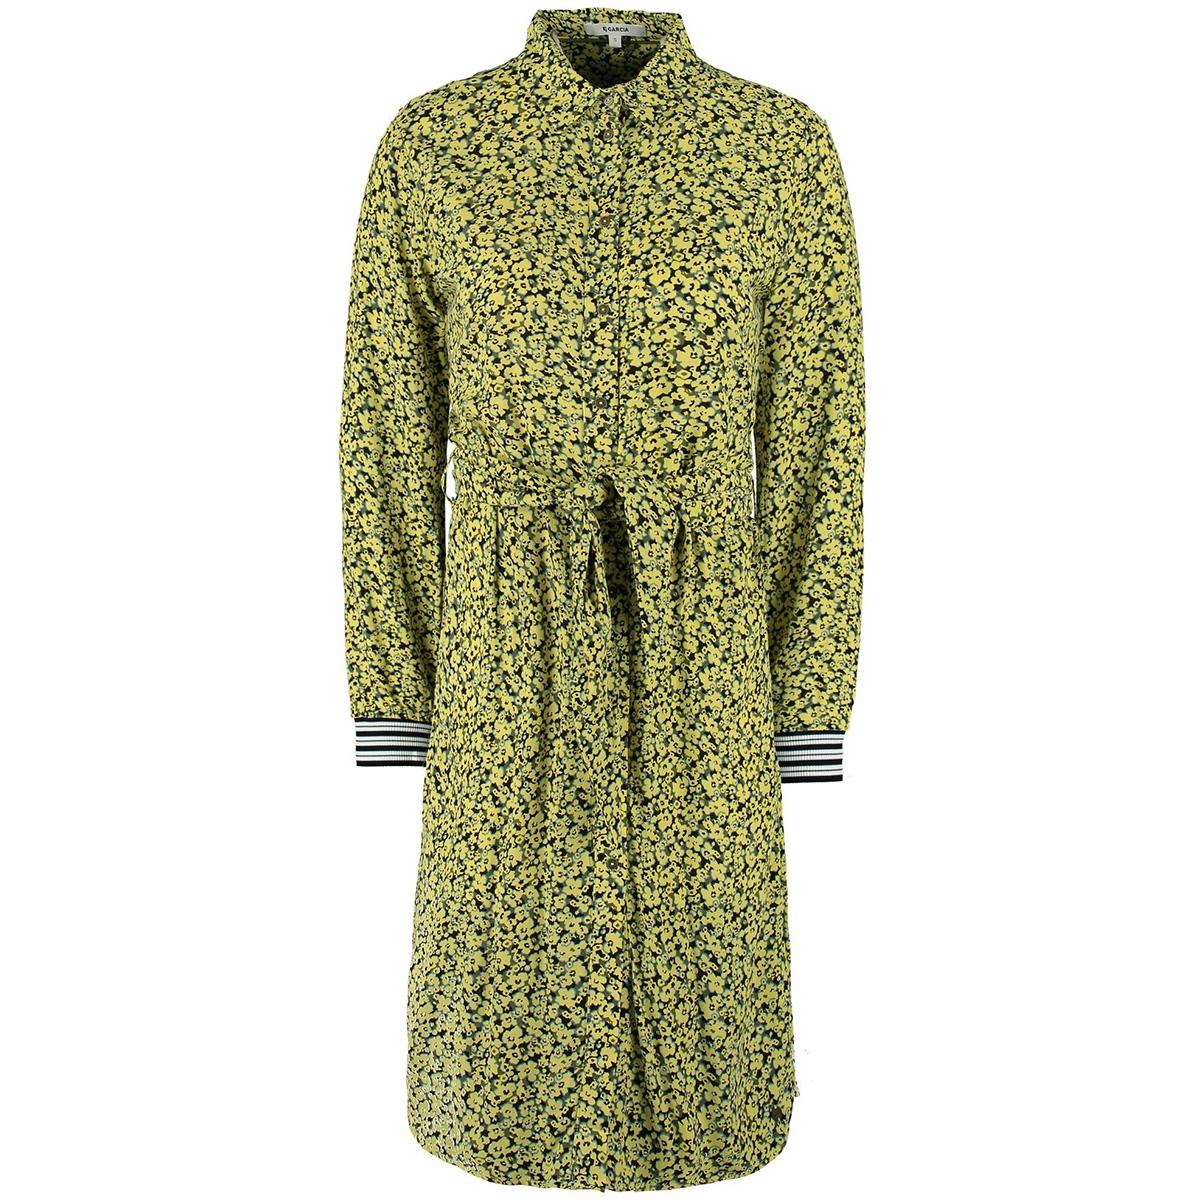 blousejurk met bloemenprint m00080 garcia jurk 145 limelight